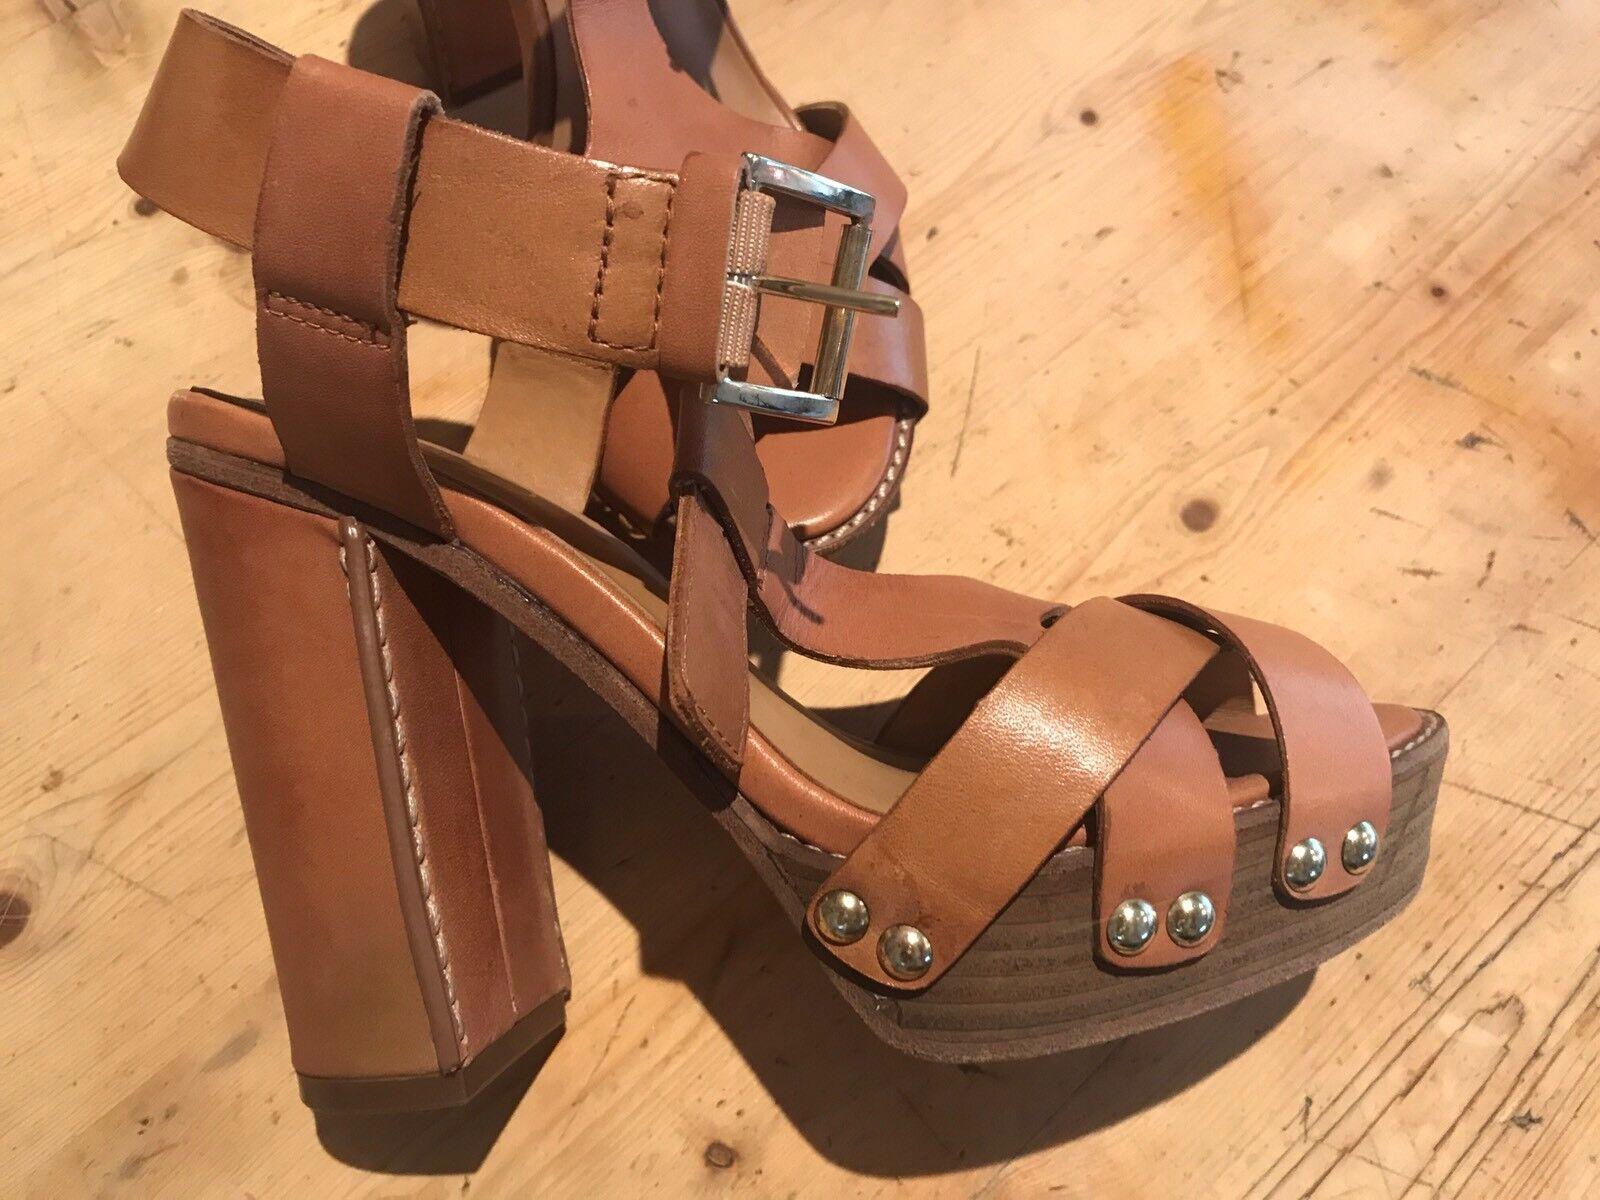 ASH Leder Schuhes Größe 36 Eu Braun Brand Brand Brand New 8fee0d